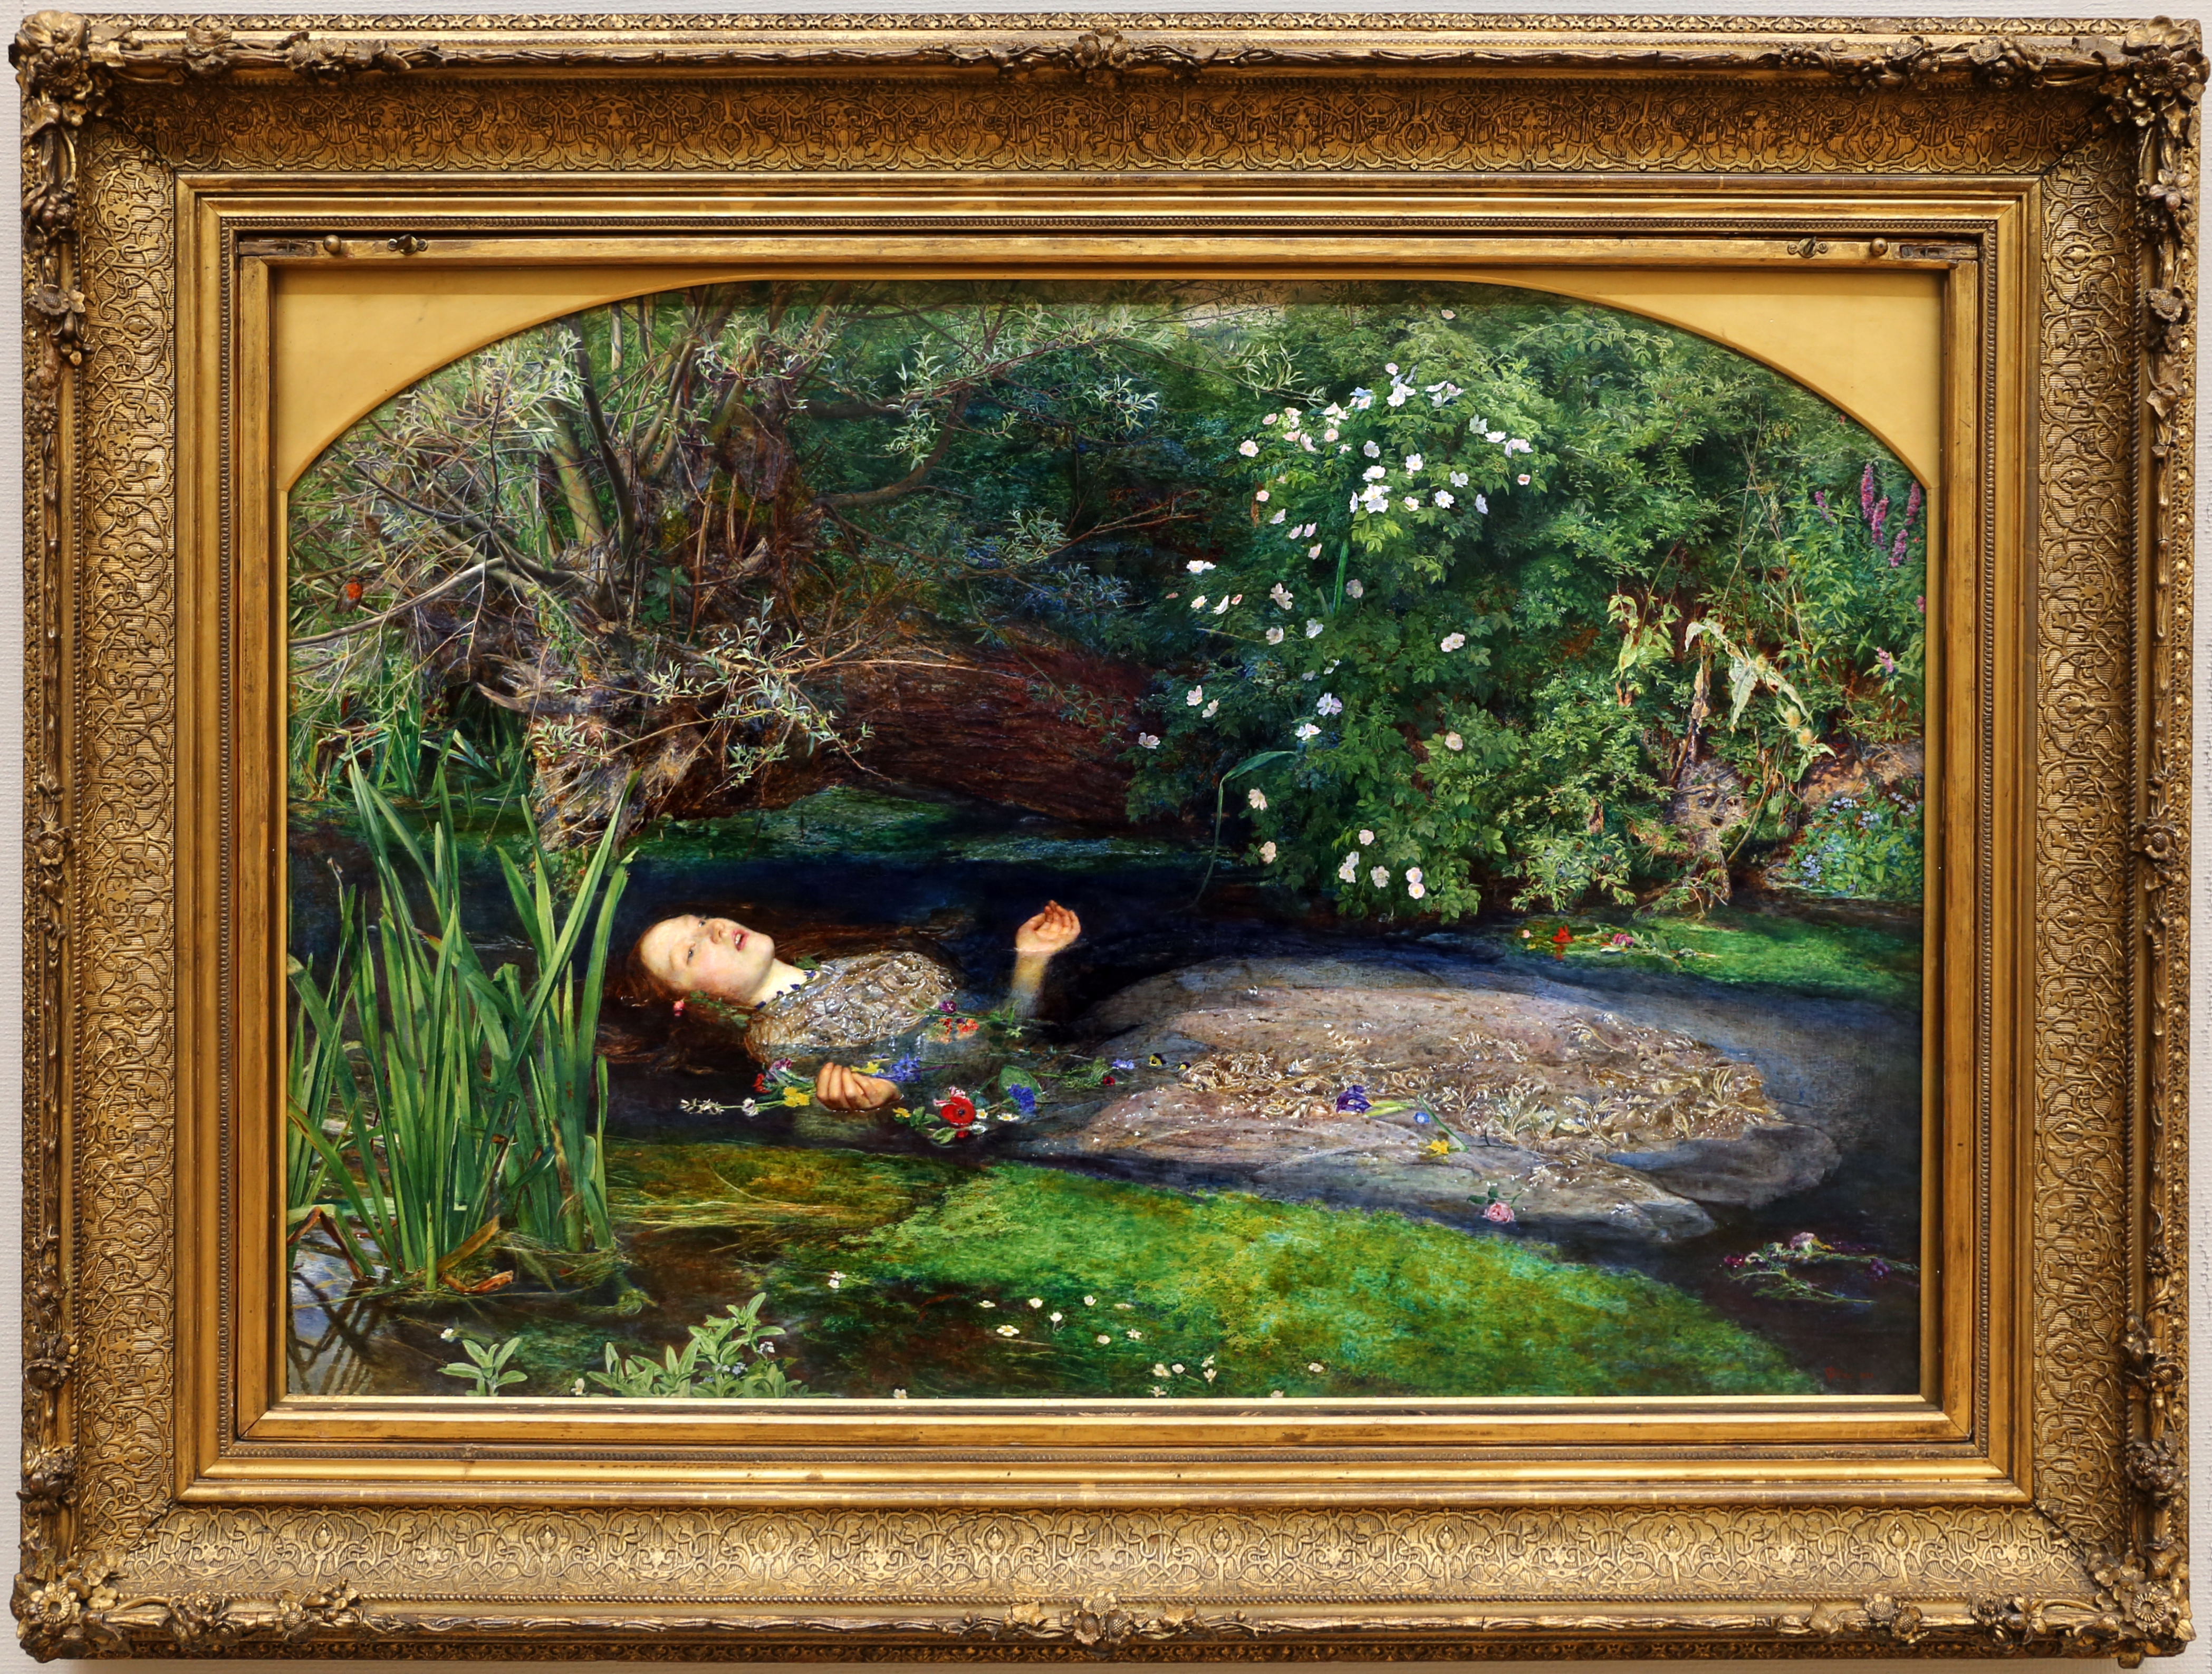 File:John everett millais, ofelia, 1851-52, 01 jpg